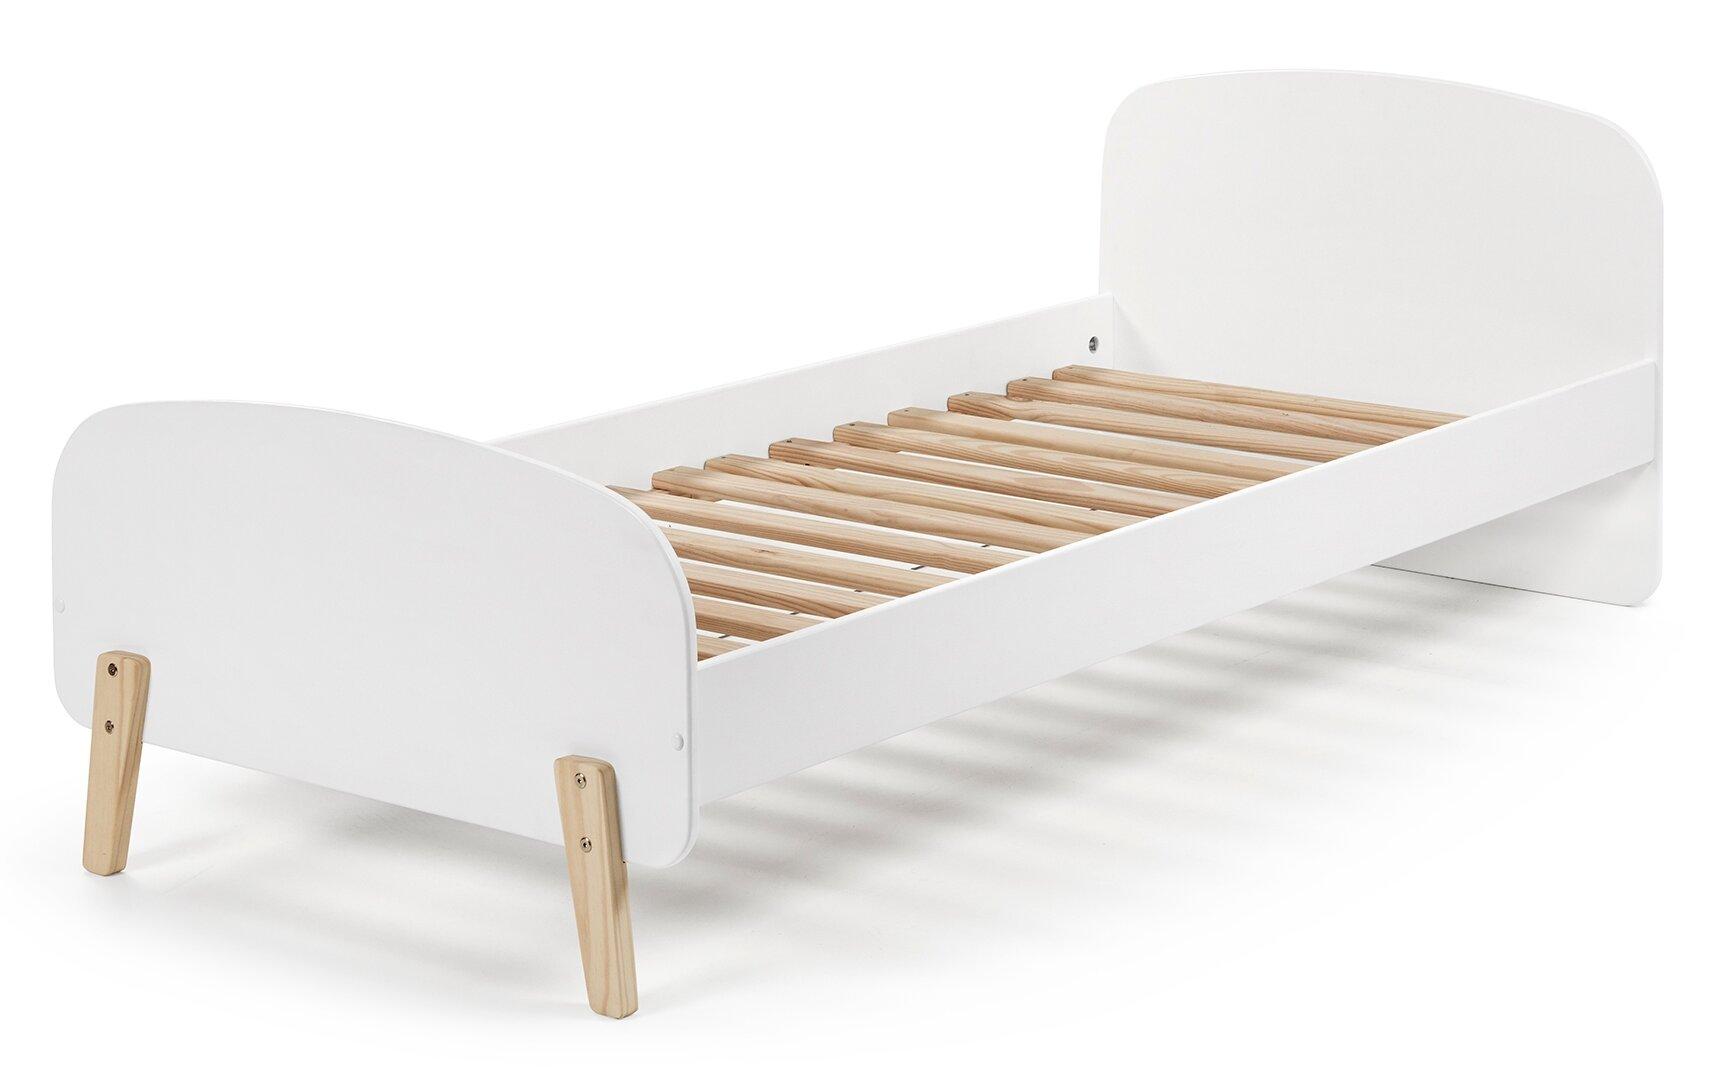 Etagenbett Luca : Nett kinder etagenbetten prissy design etagenbett kinderzimmer